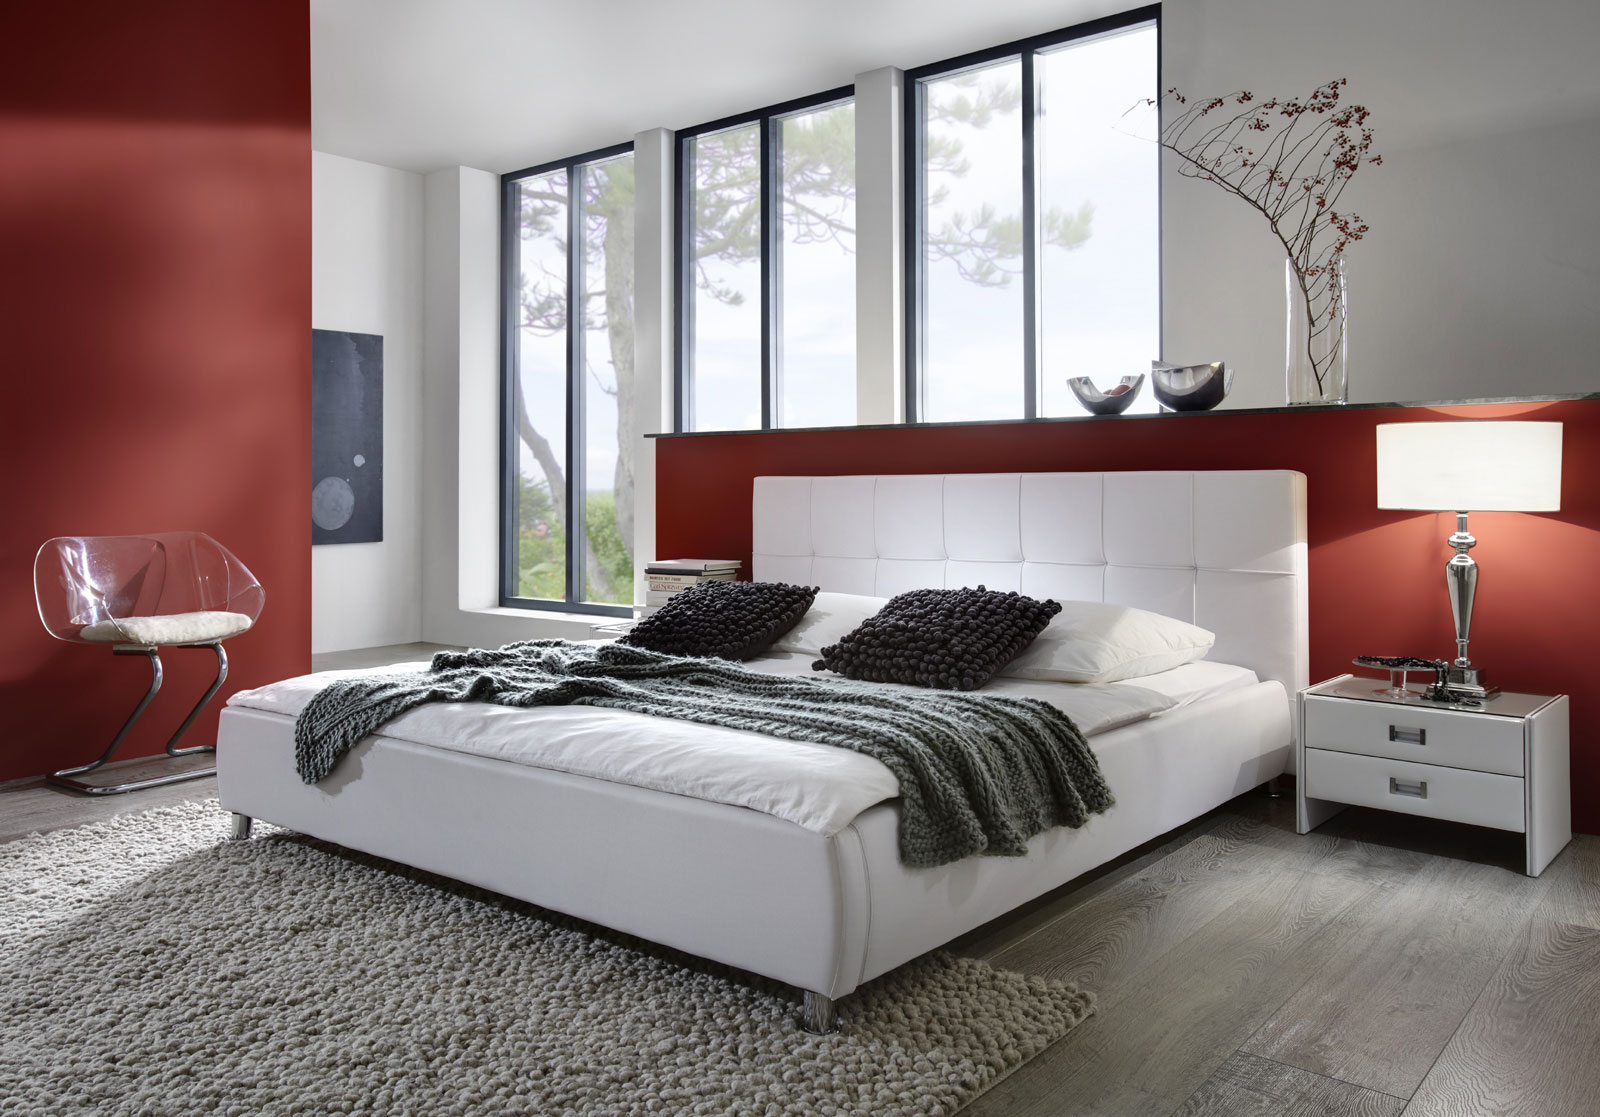 sam polsterbett doppelbett bett 140 cm x 200 cm wei zarah. Black Bedroom Furniture Sets. Home Design Ideas